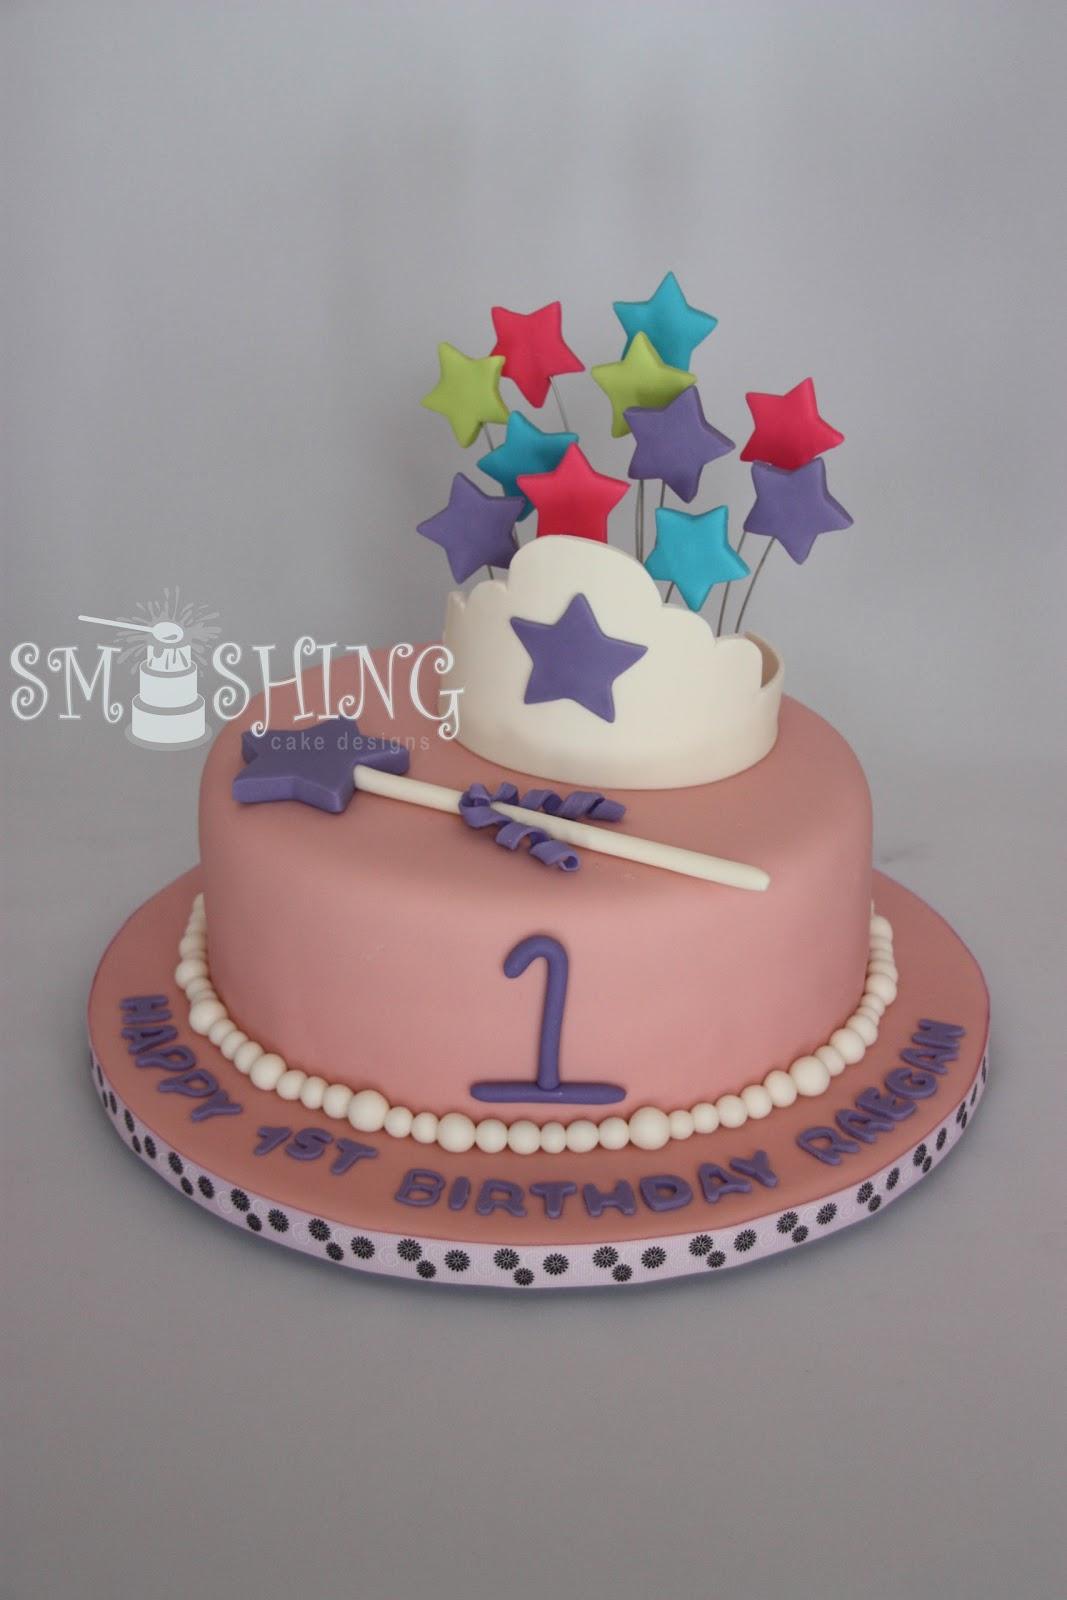 Cake Designs For 1st Birthday Girl Best Christmas Gifts